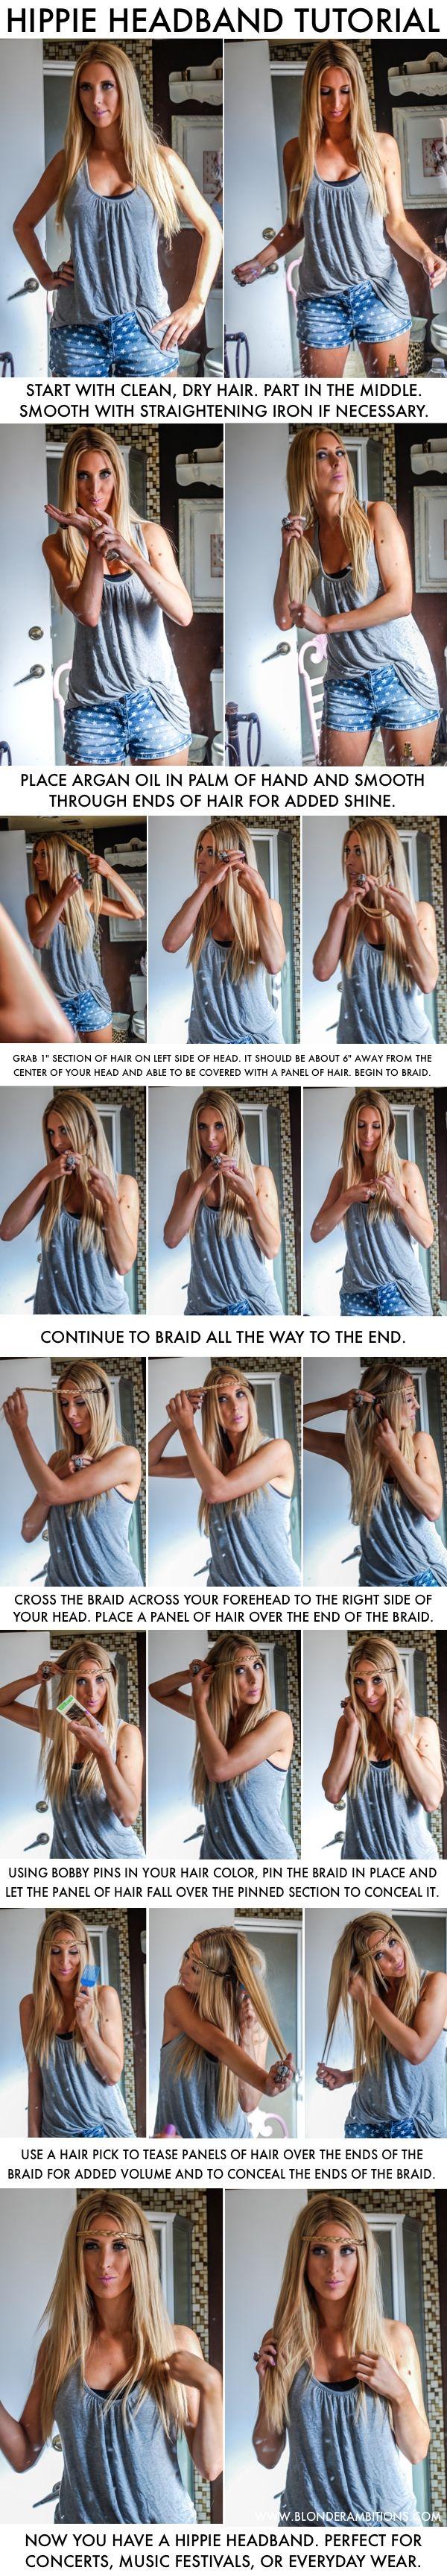 Coachella Hair. California Hair. How To Do Your Hair in the Summer. Summer Hair. #blonderambitions